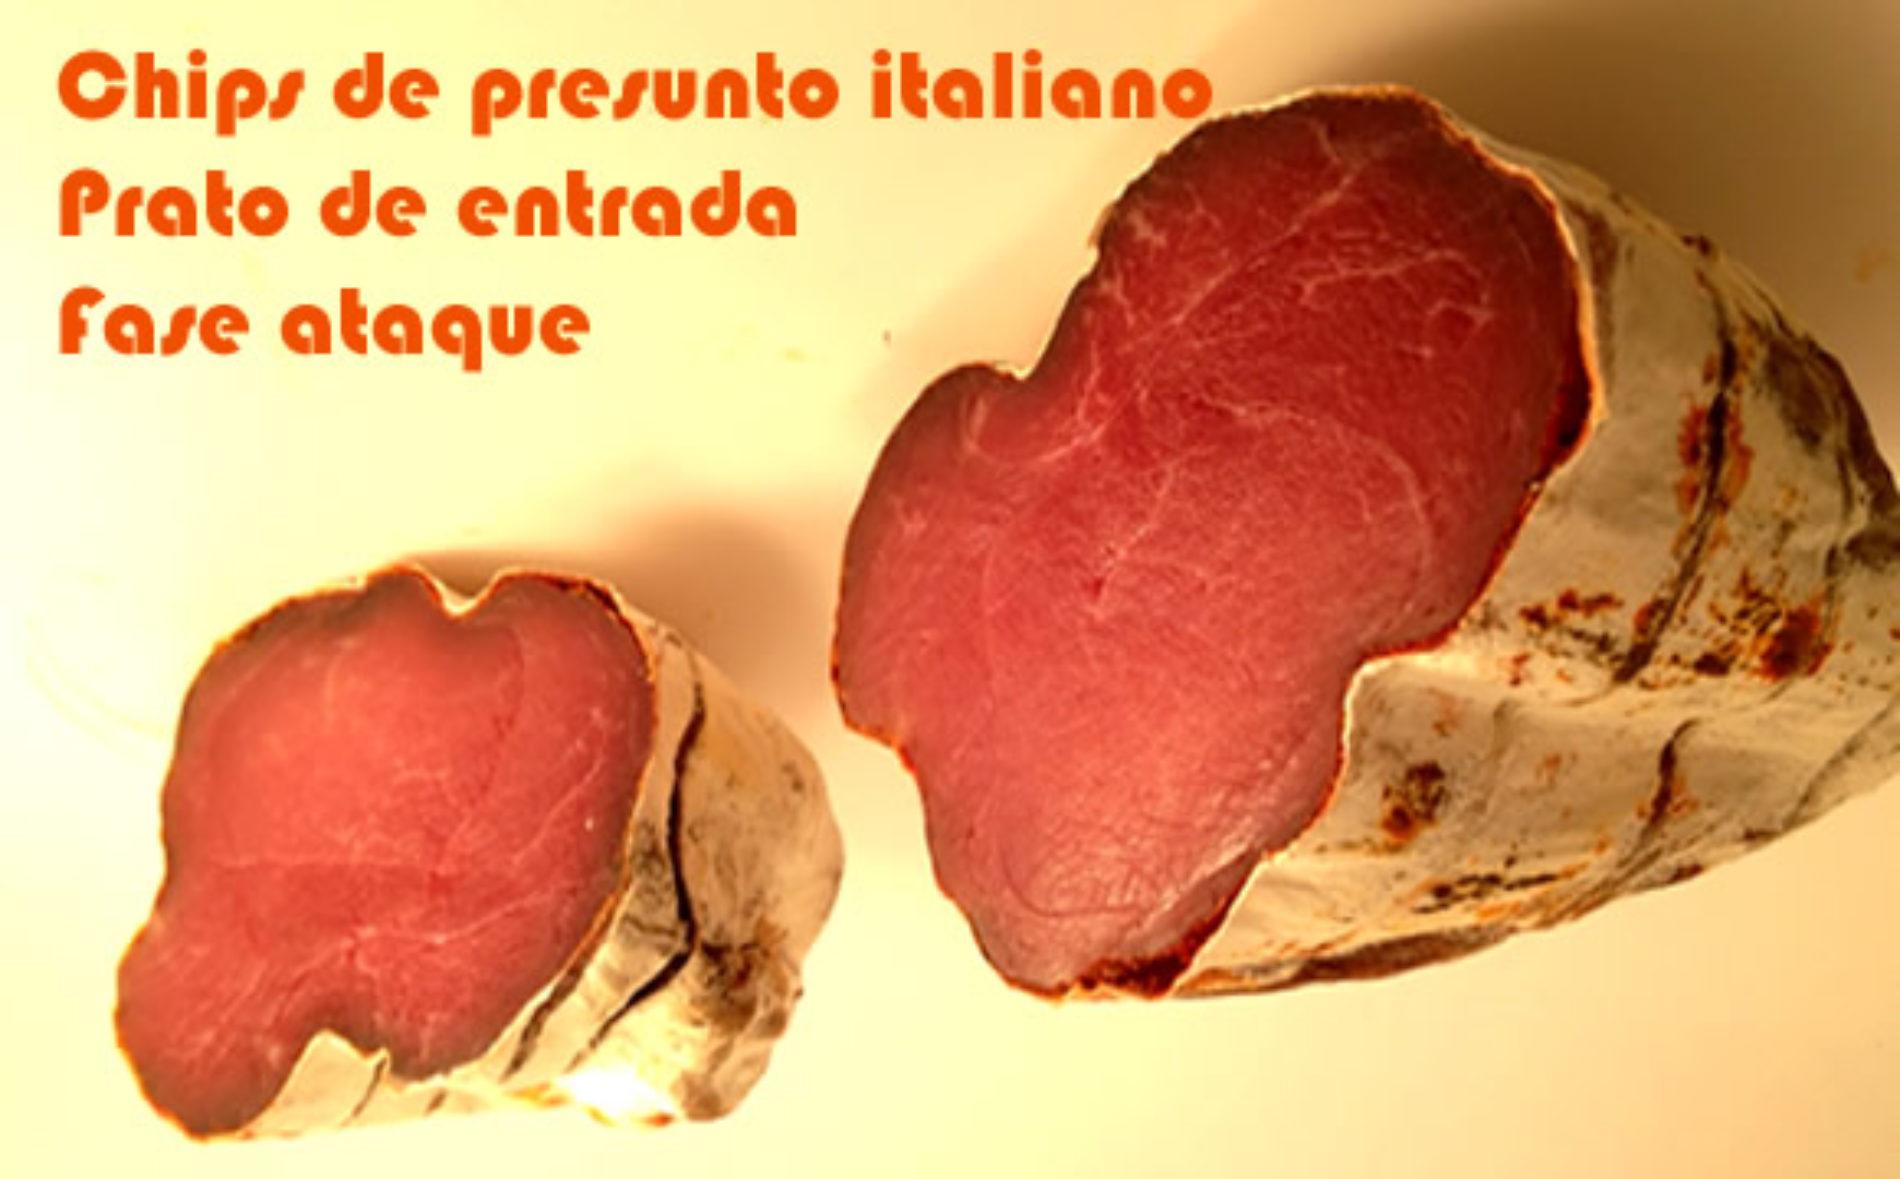 Chips de bresaola, presunto italiano